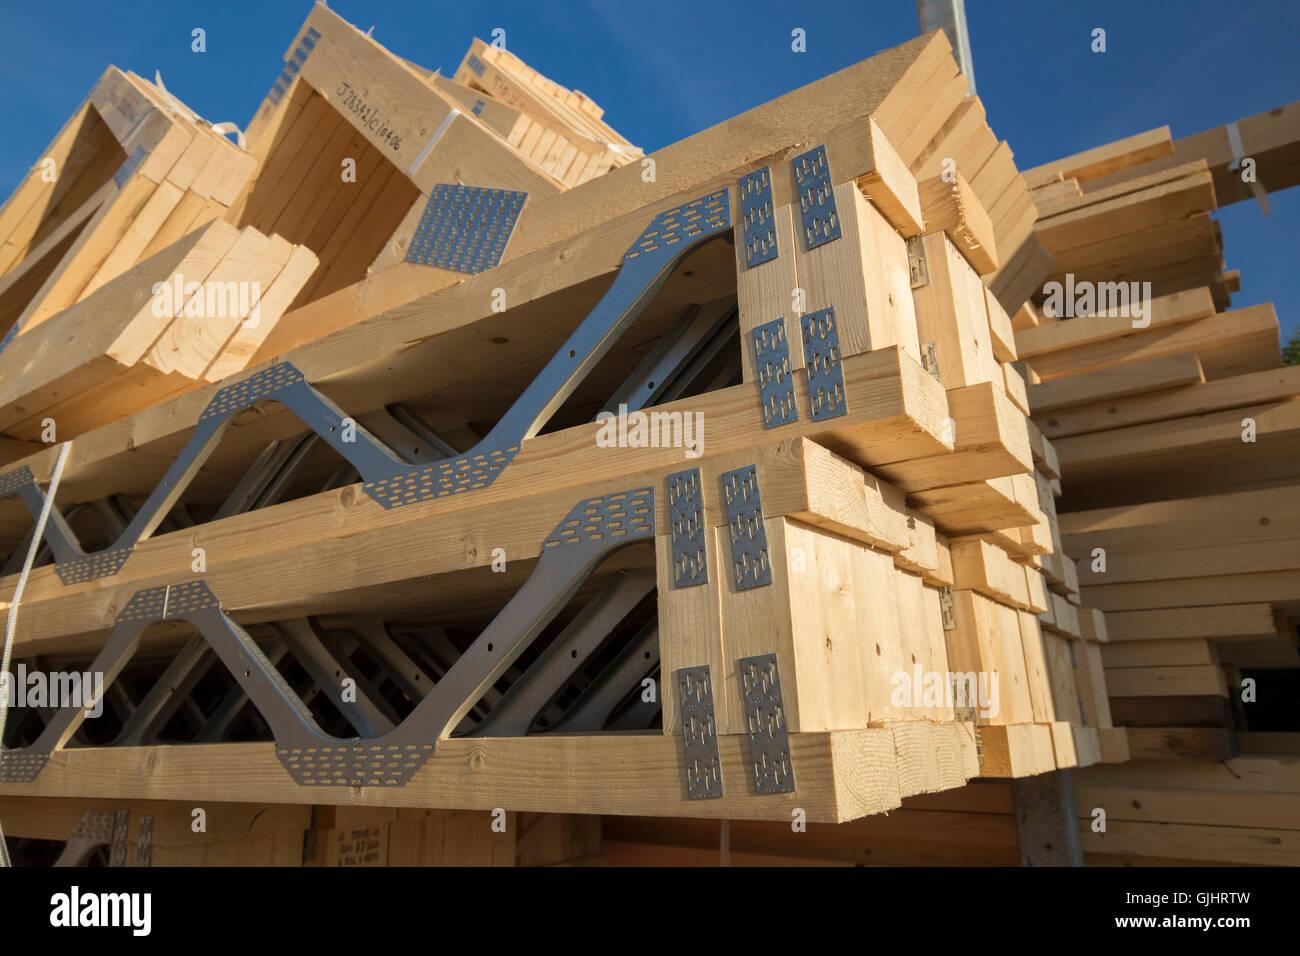 Wooden Roof Truss Uk Stock Photo Alamy